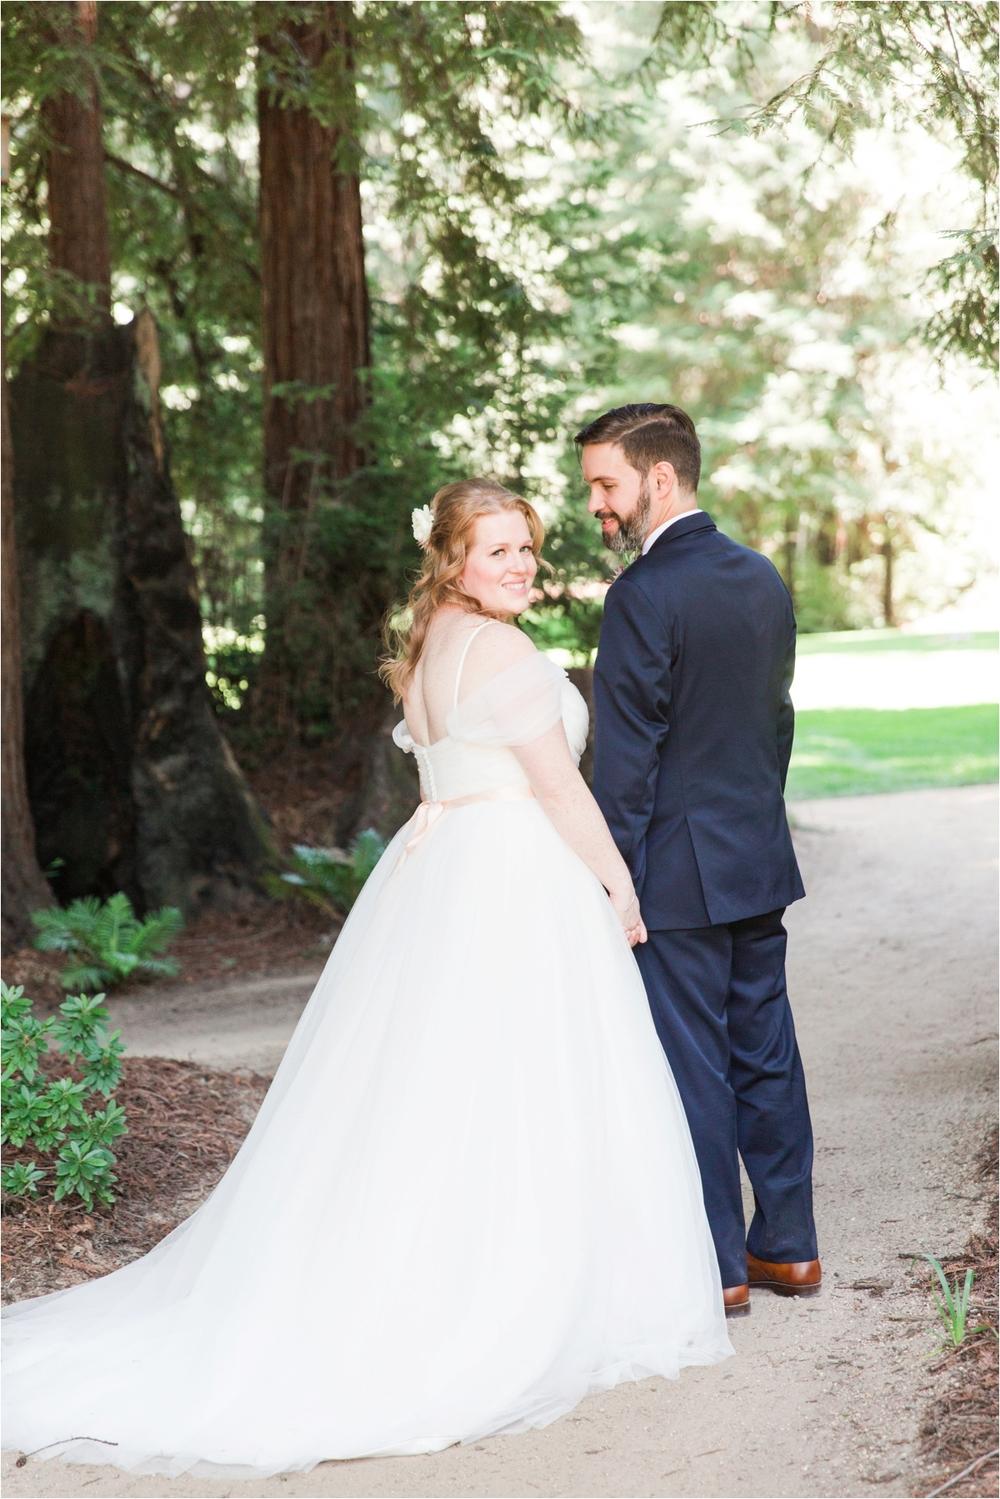 Nestldown wedding Photos by Briana Calderon Photography_0179.jpg